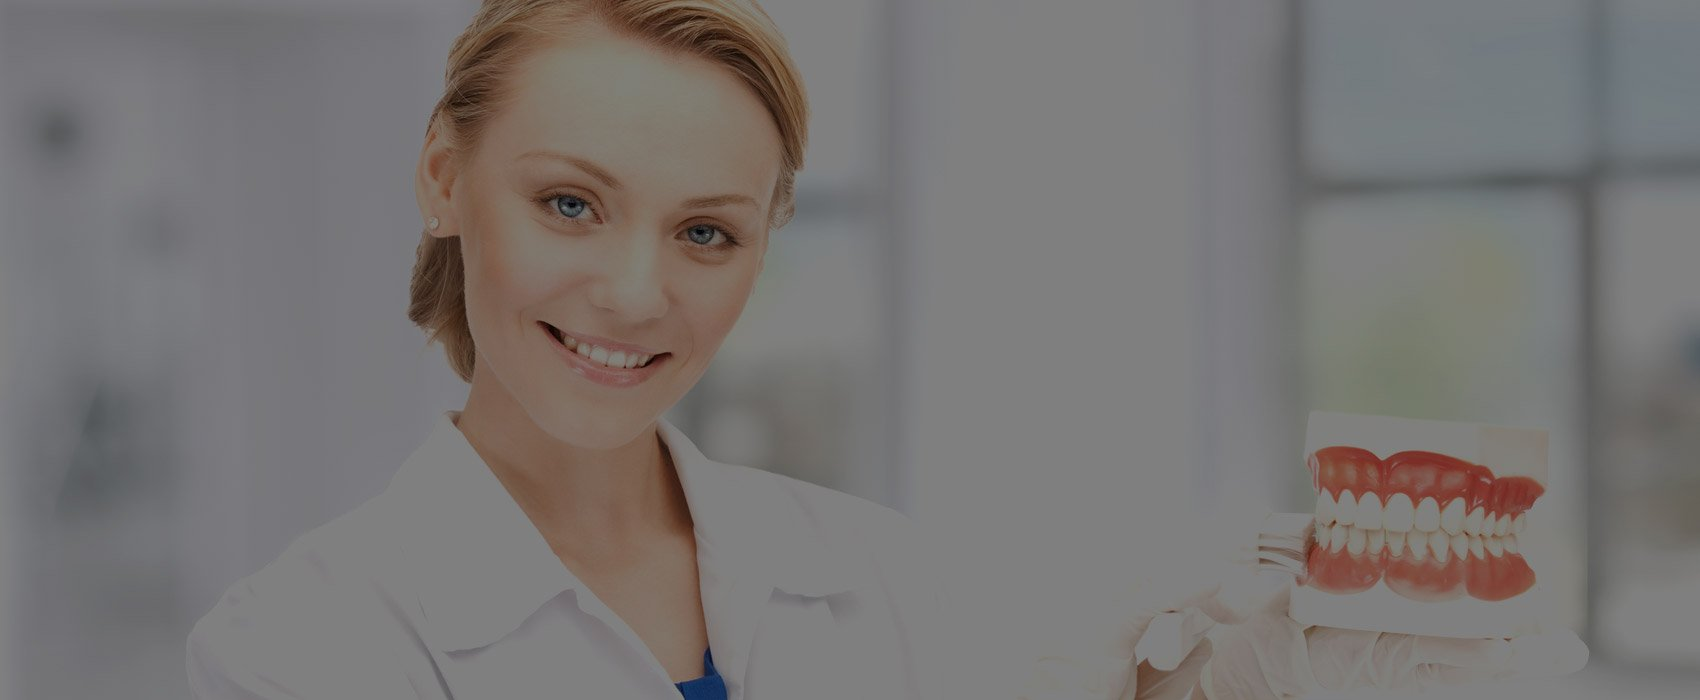 Preventive Dentistry, UT